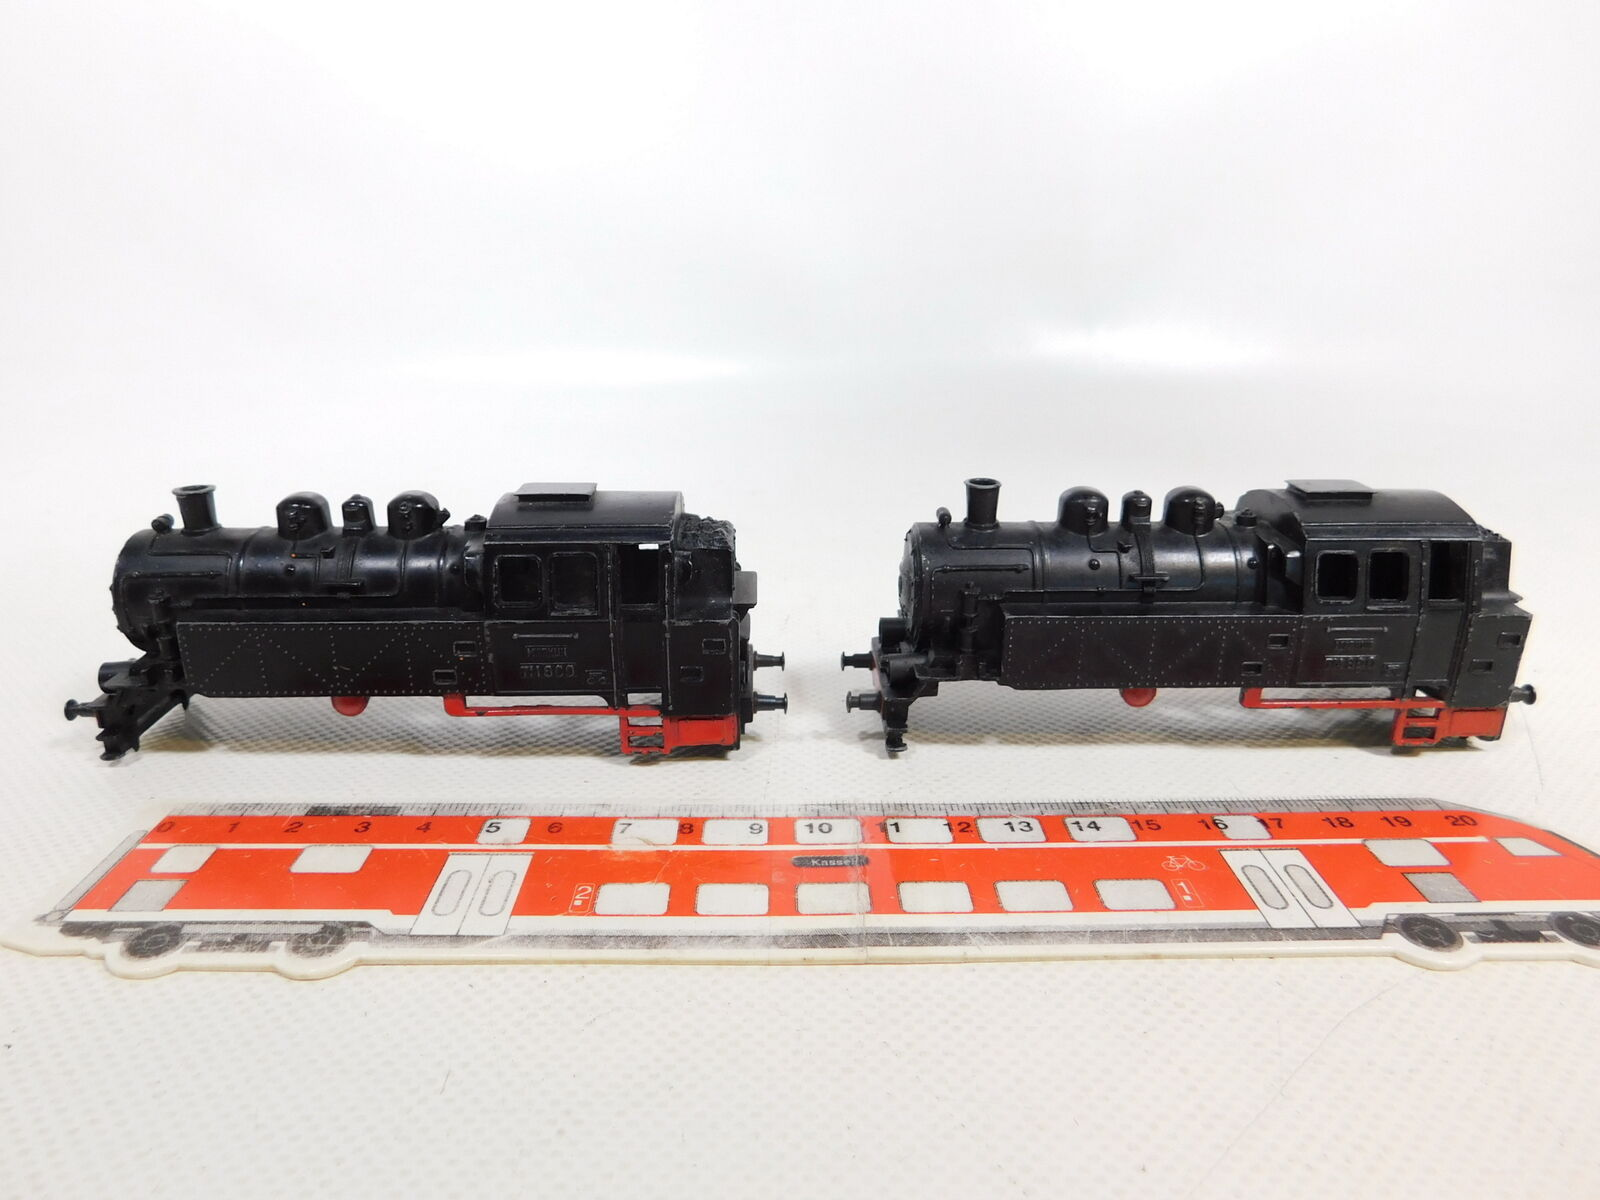 CE401-0,5  2x Märklin H0 00 Guss-Gehäuse für TM 800 Tenderlok, gebraucht